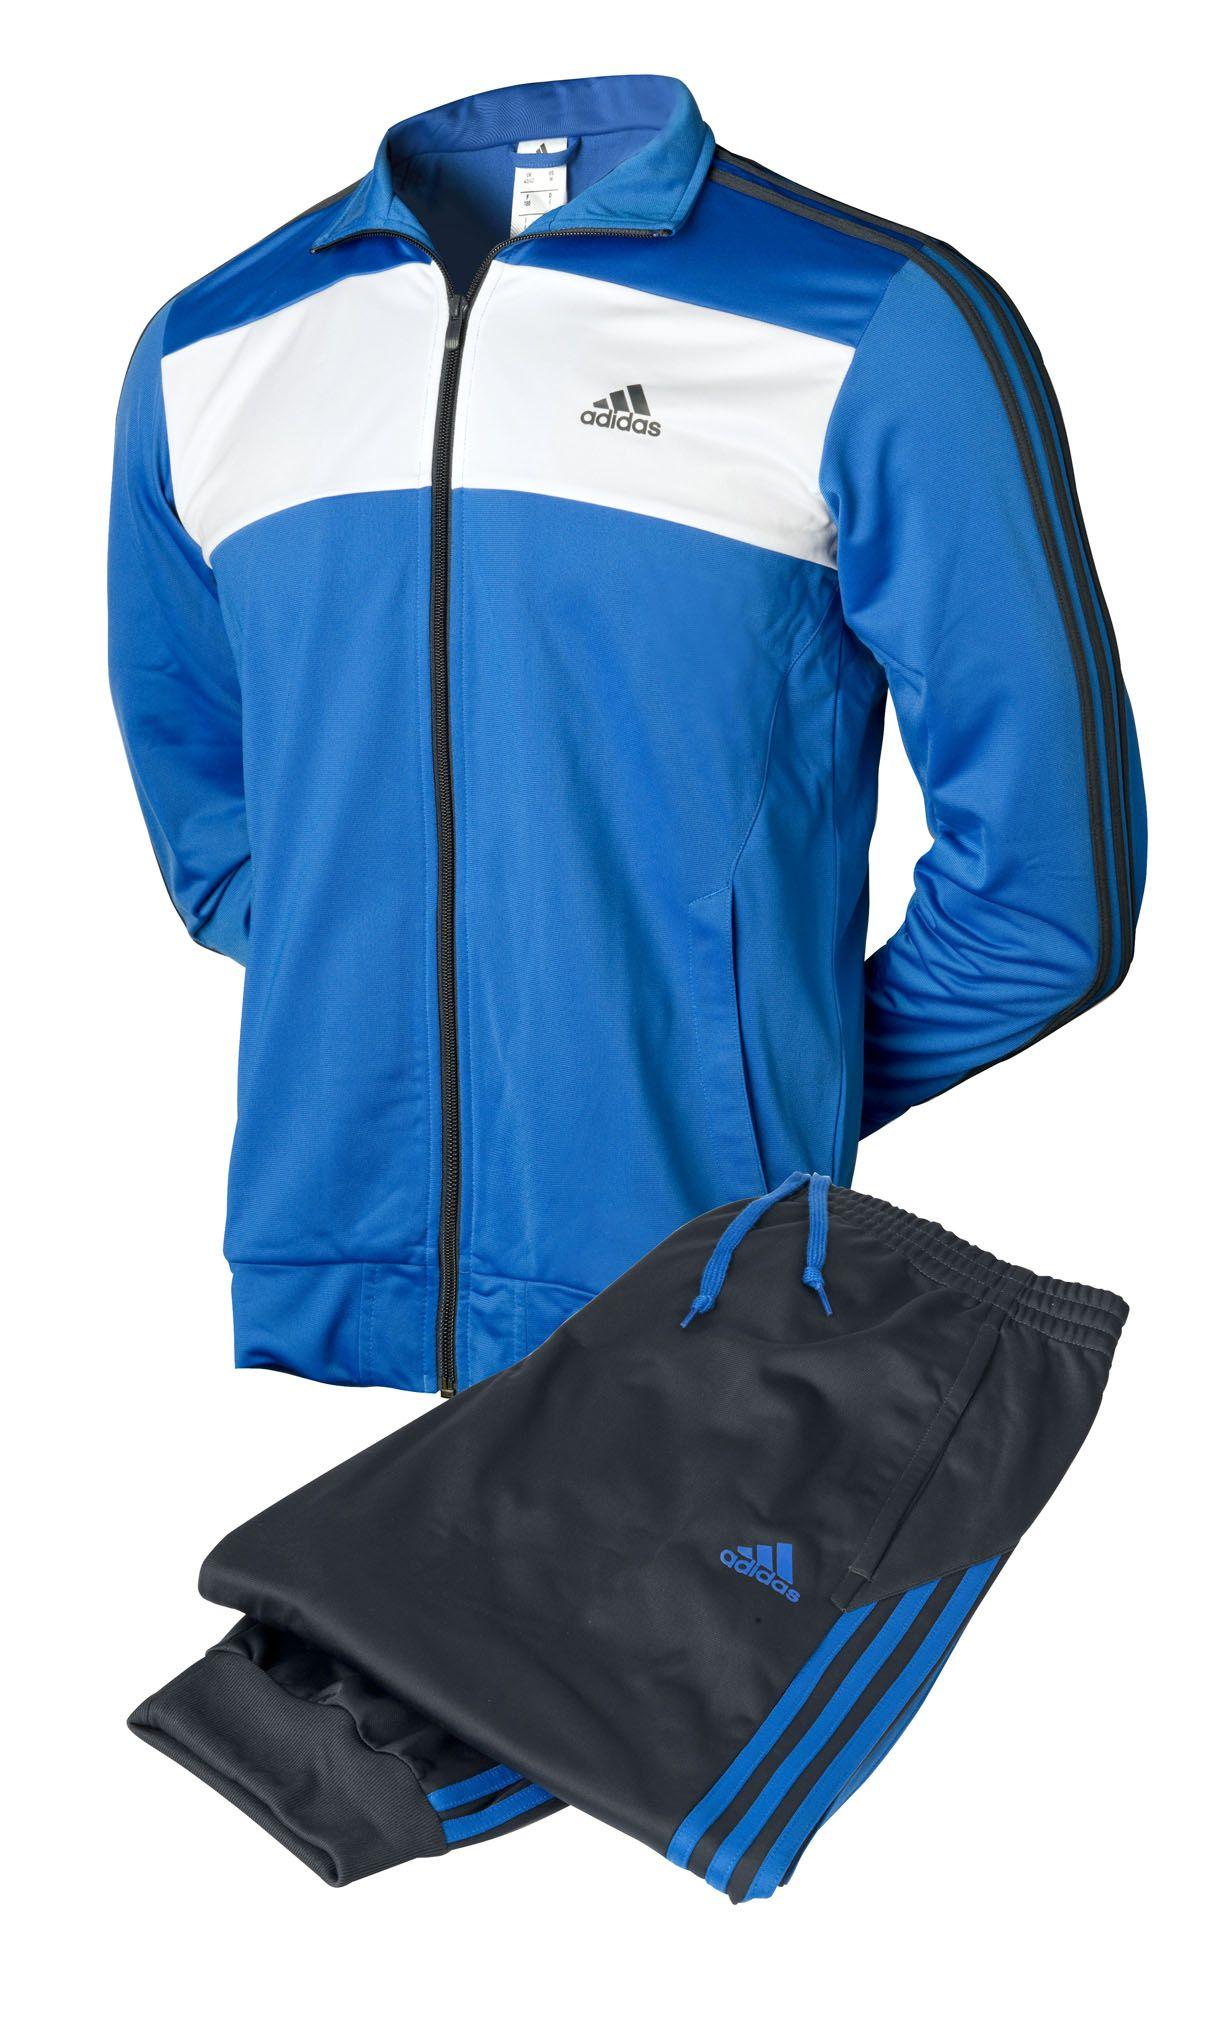 a19c7c64d25e Chándal Adidas Hombre  casual  sport  ropa  moda